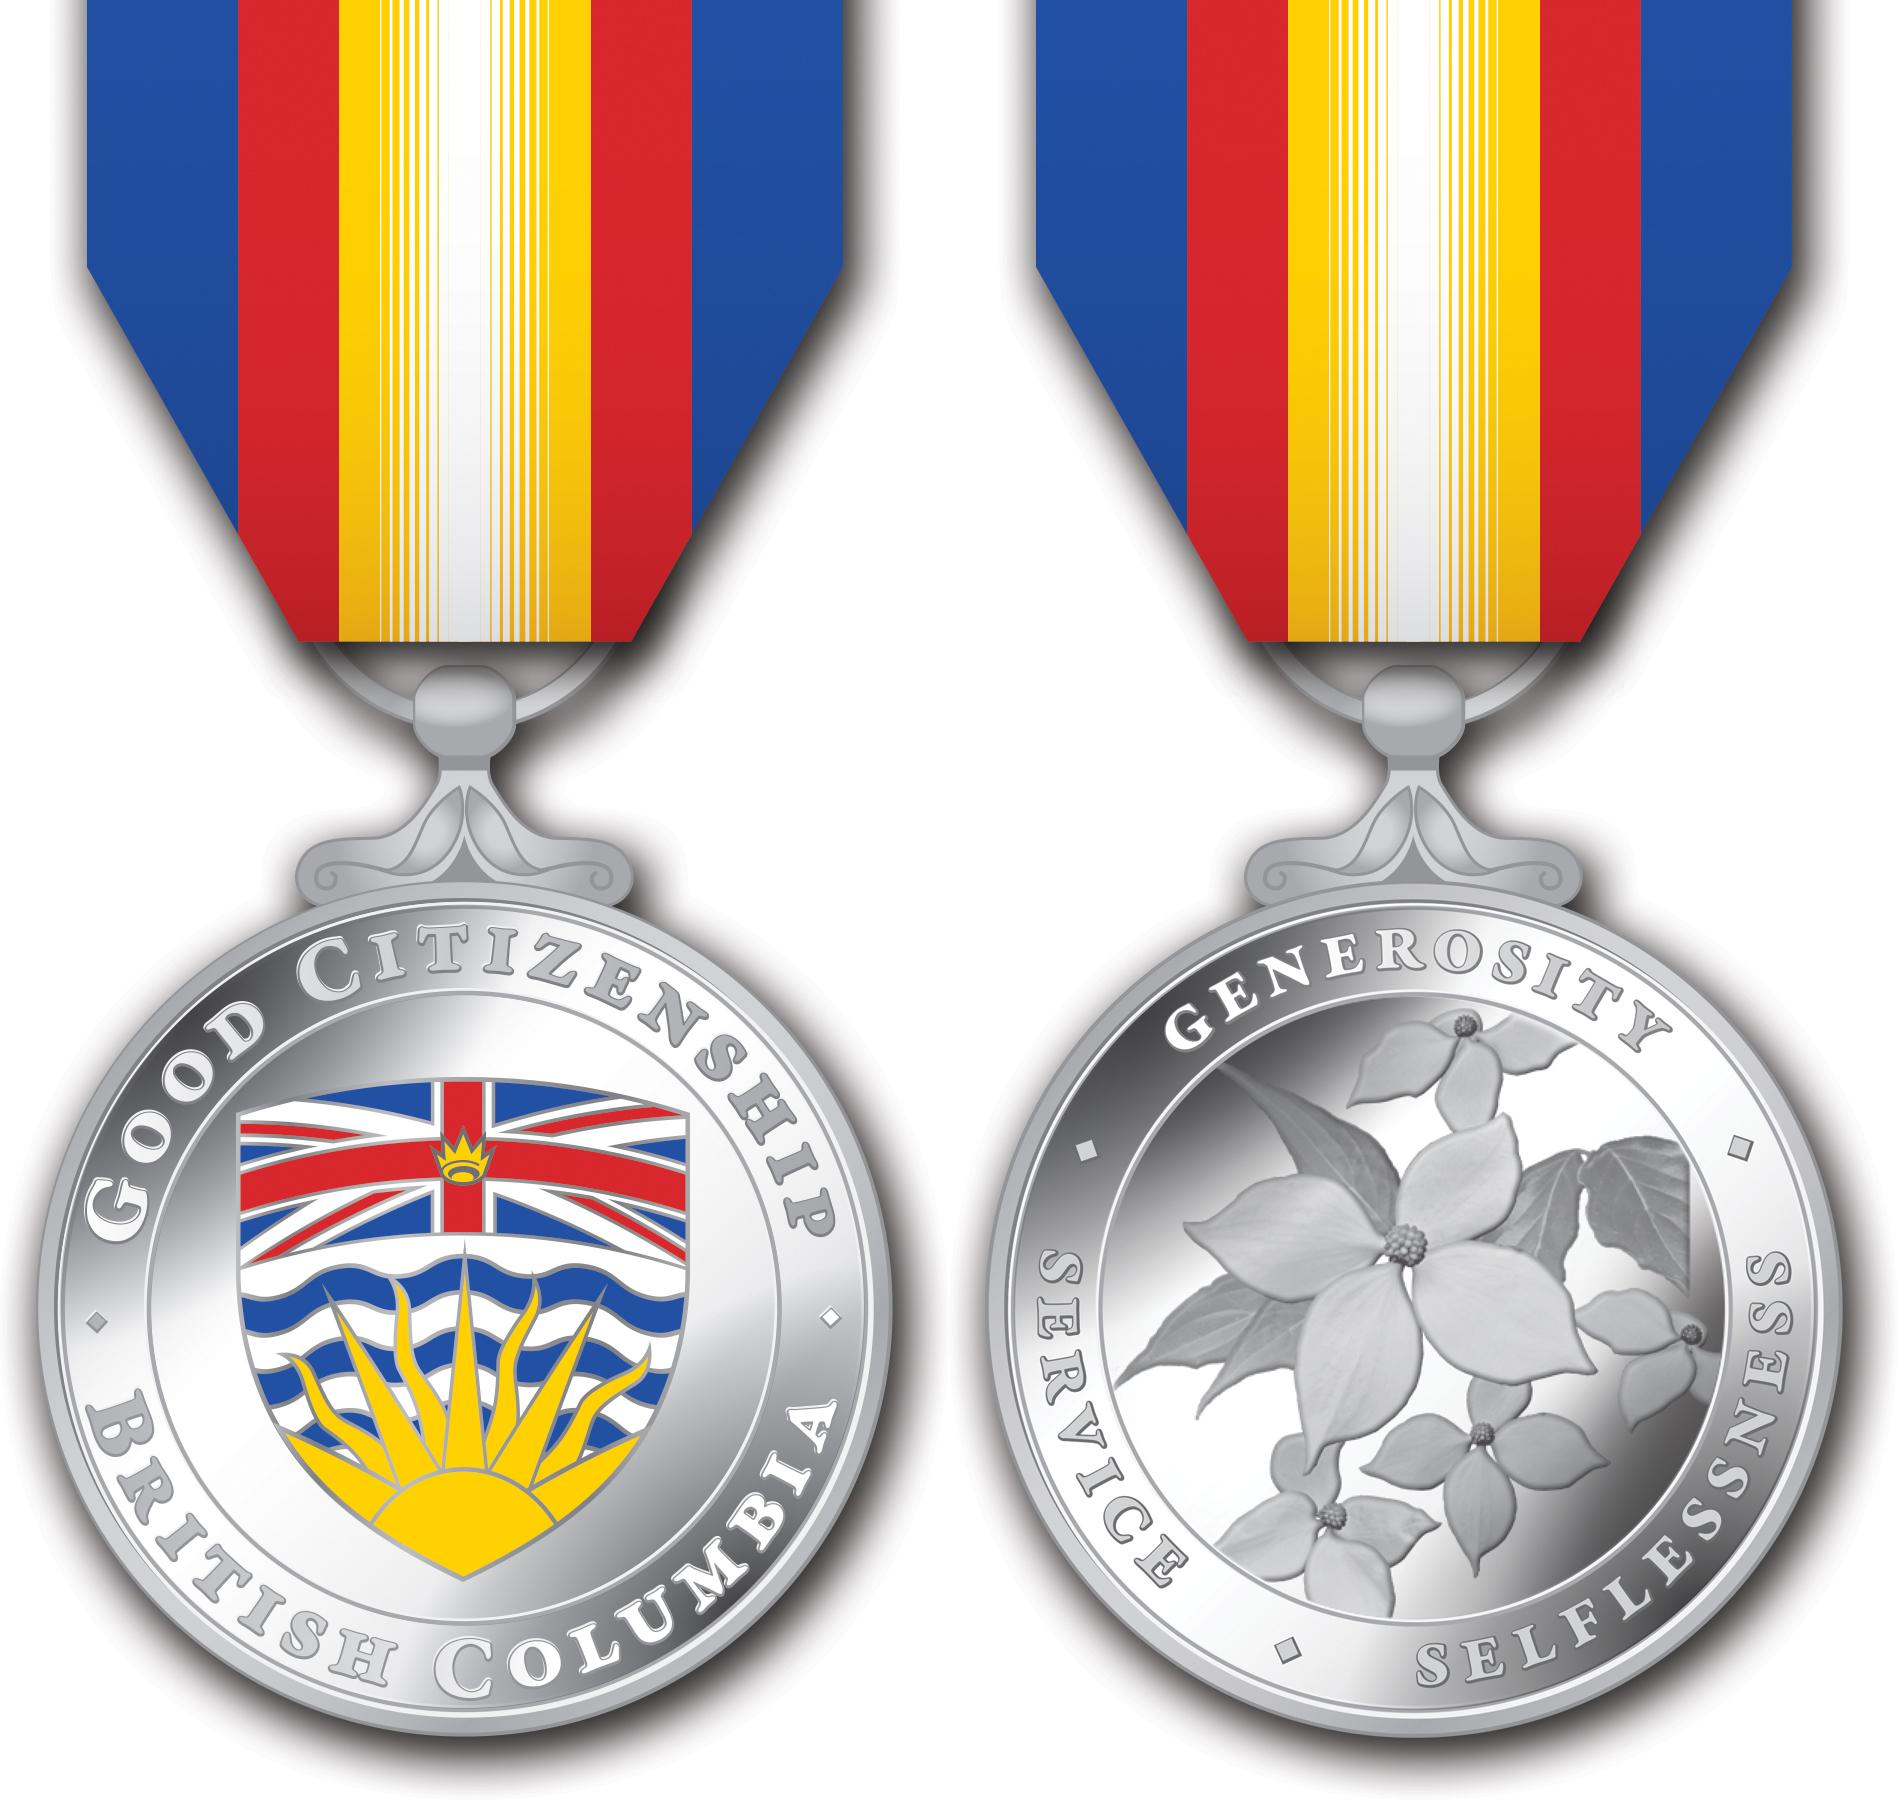 The Medal Of Good Citizenship Design